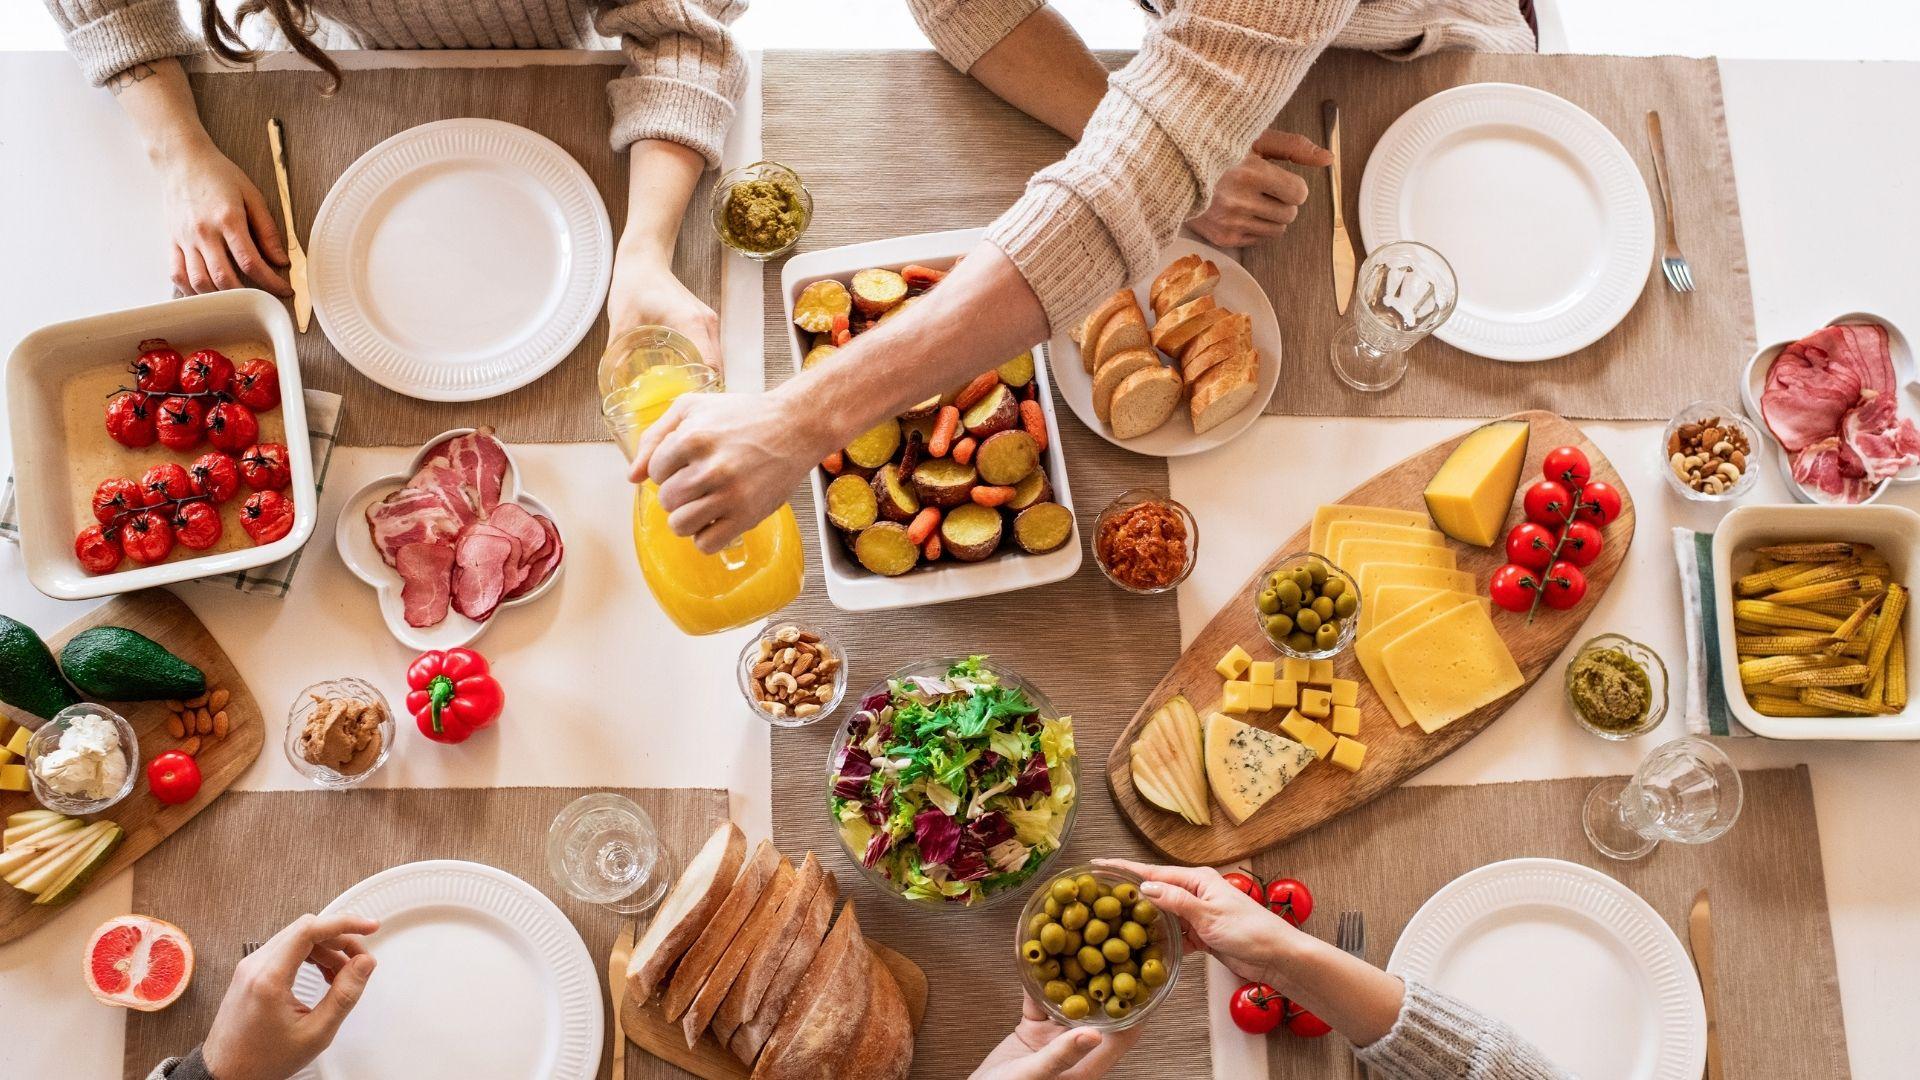 Intuitiv essen - Titelbild